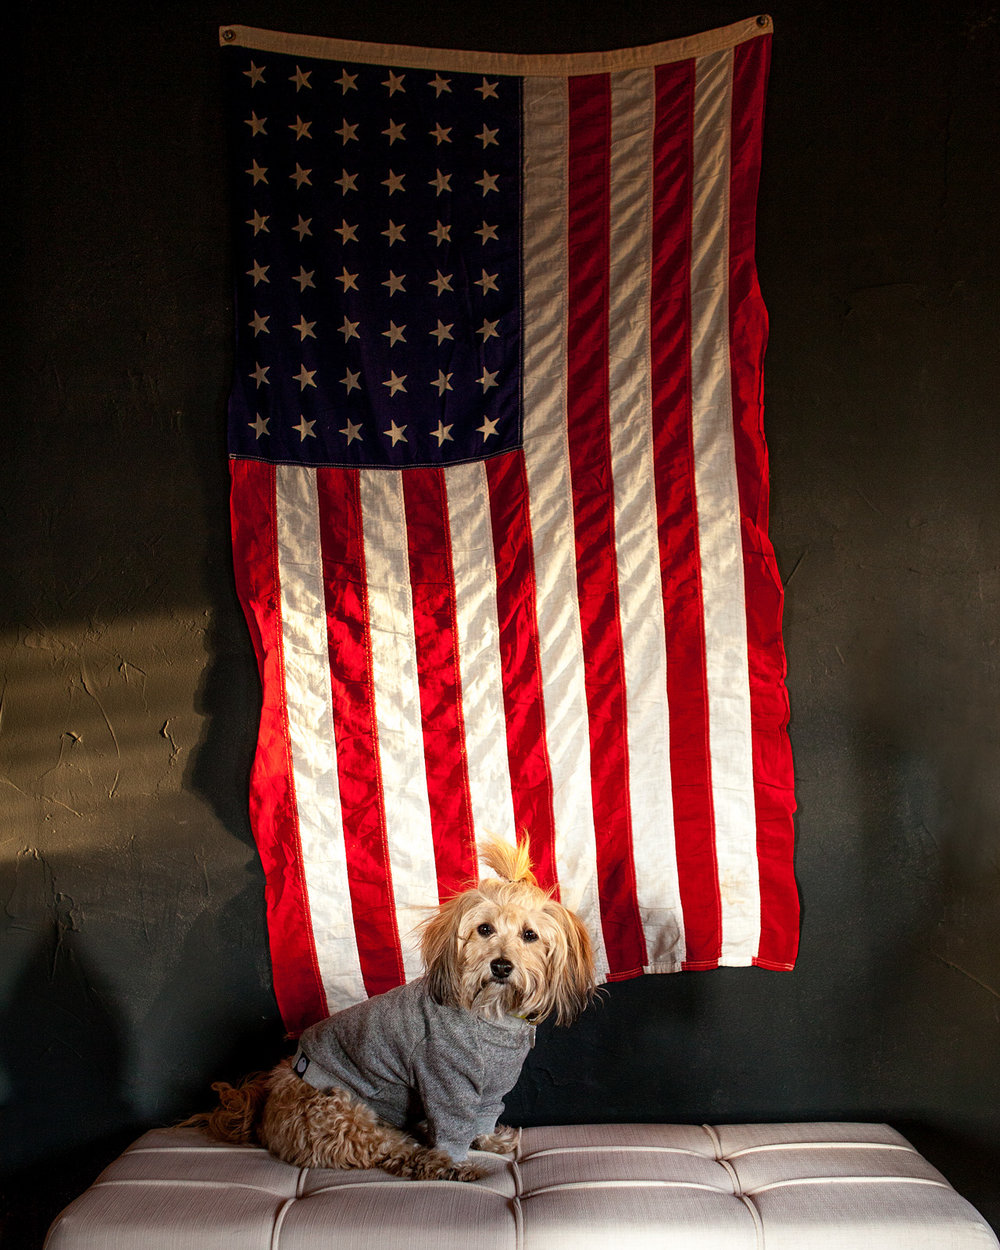 DOG & CO. | Crew Neck Sweatshirts (Back in Stock Soon!)